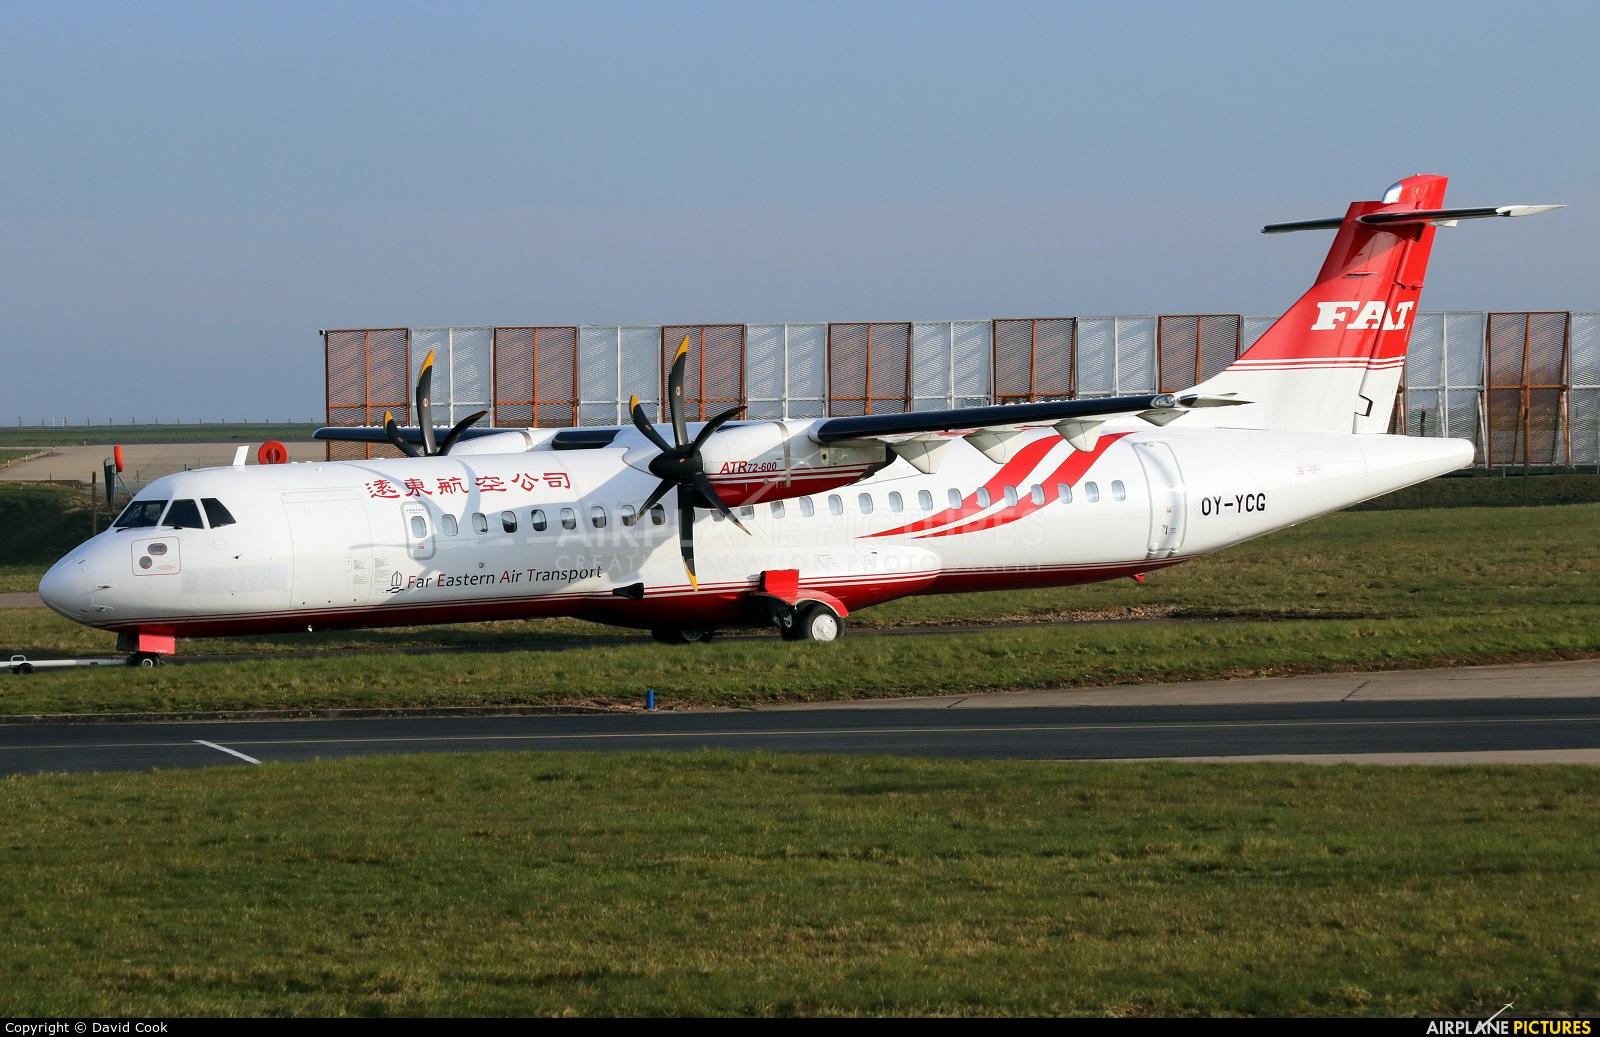 Far Eastern Air Transport OY-YCG aircraft at East Midlands